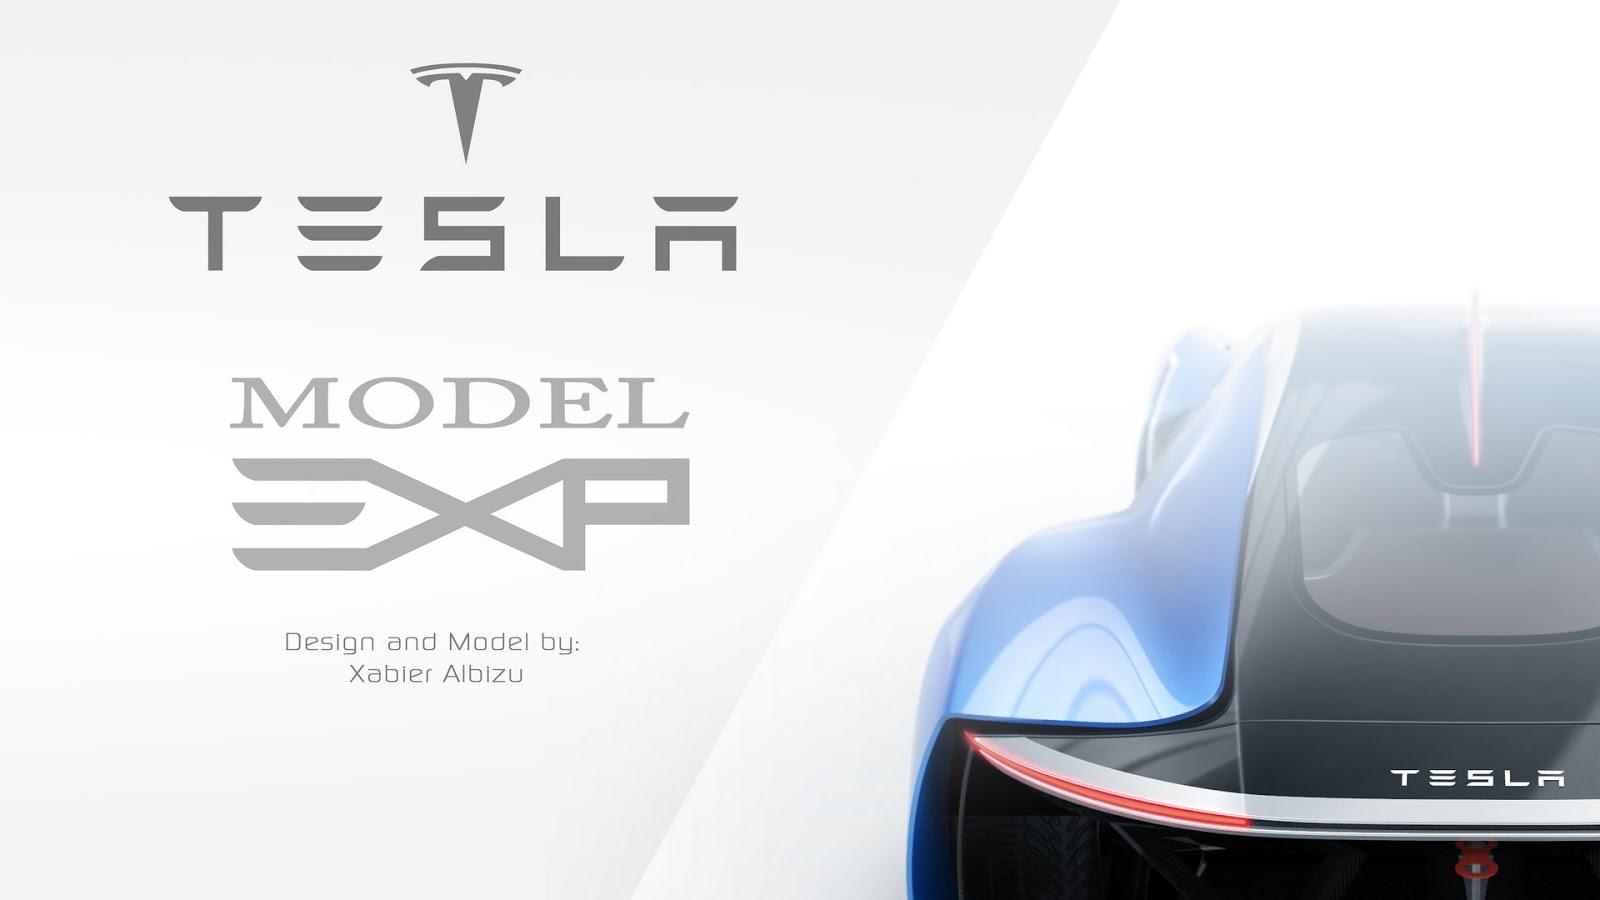 Tesla Model EXP - Rendering by Xabier Albizu